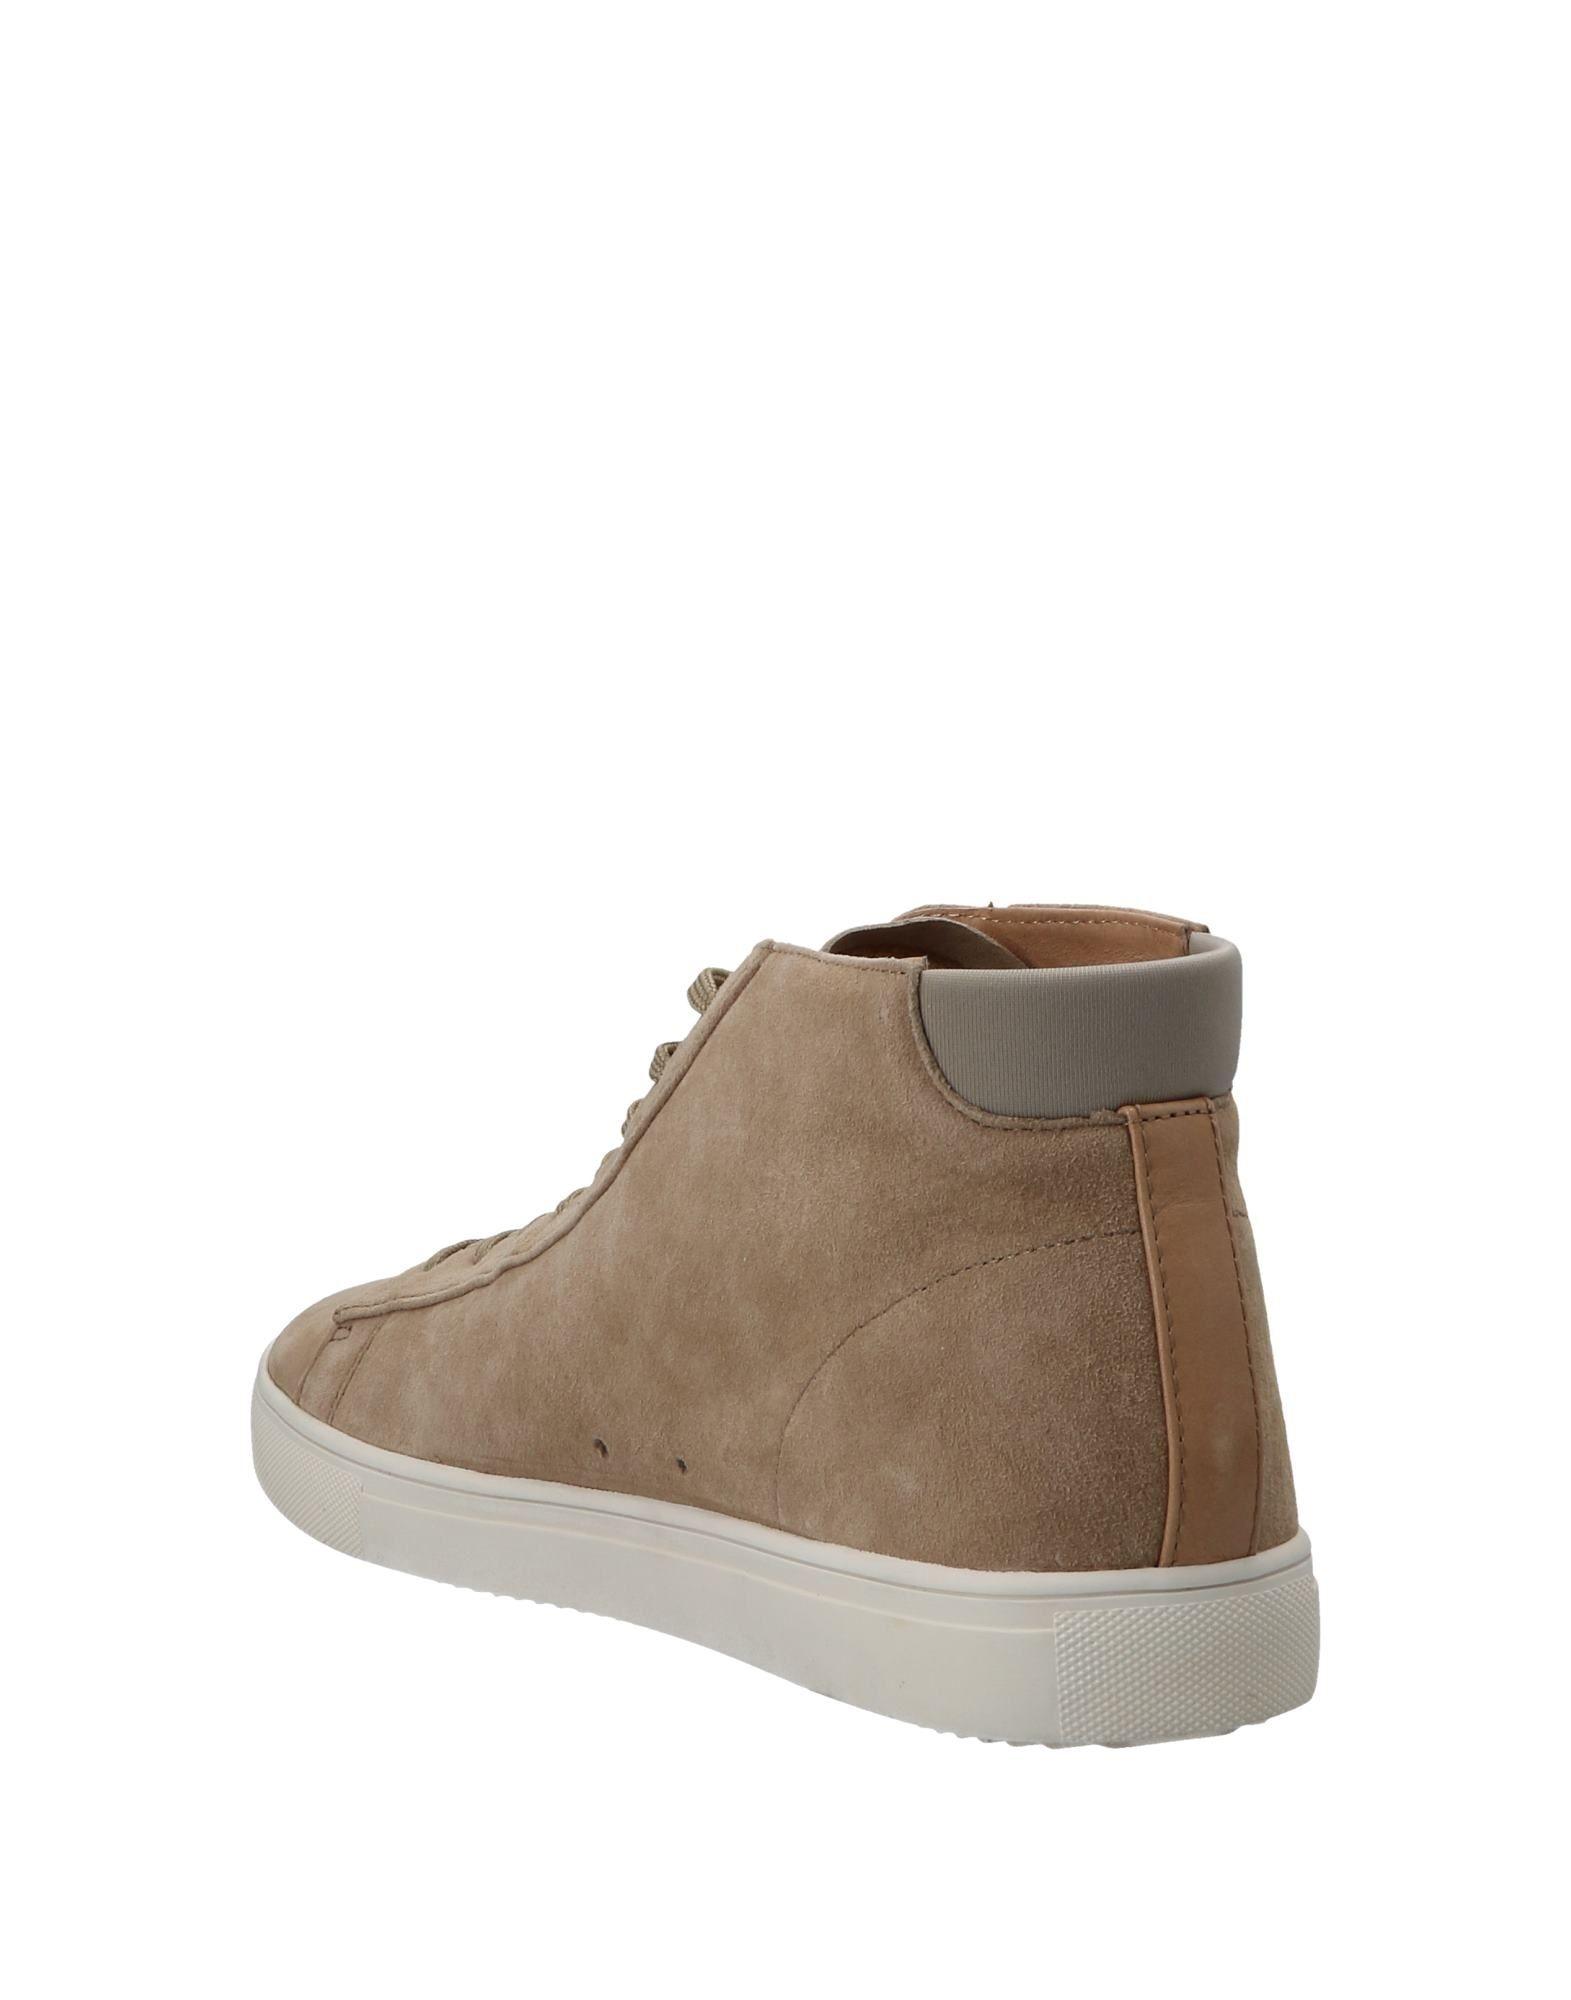 Rabatt echte  Schuhe Clae Sneakers Herren  echte 11554873EA 55a4ef